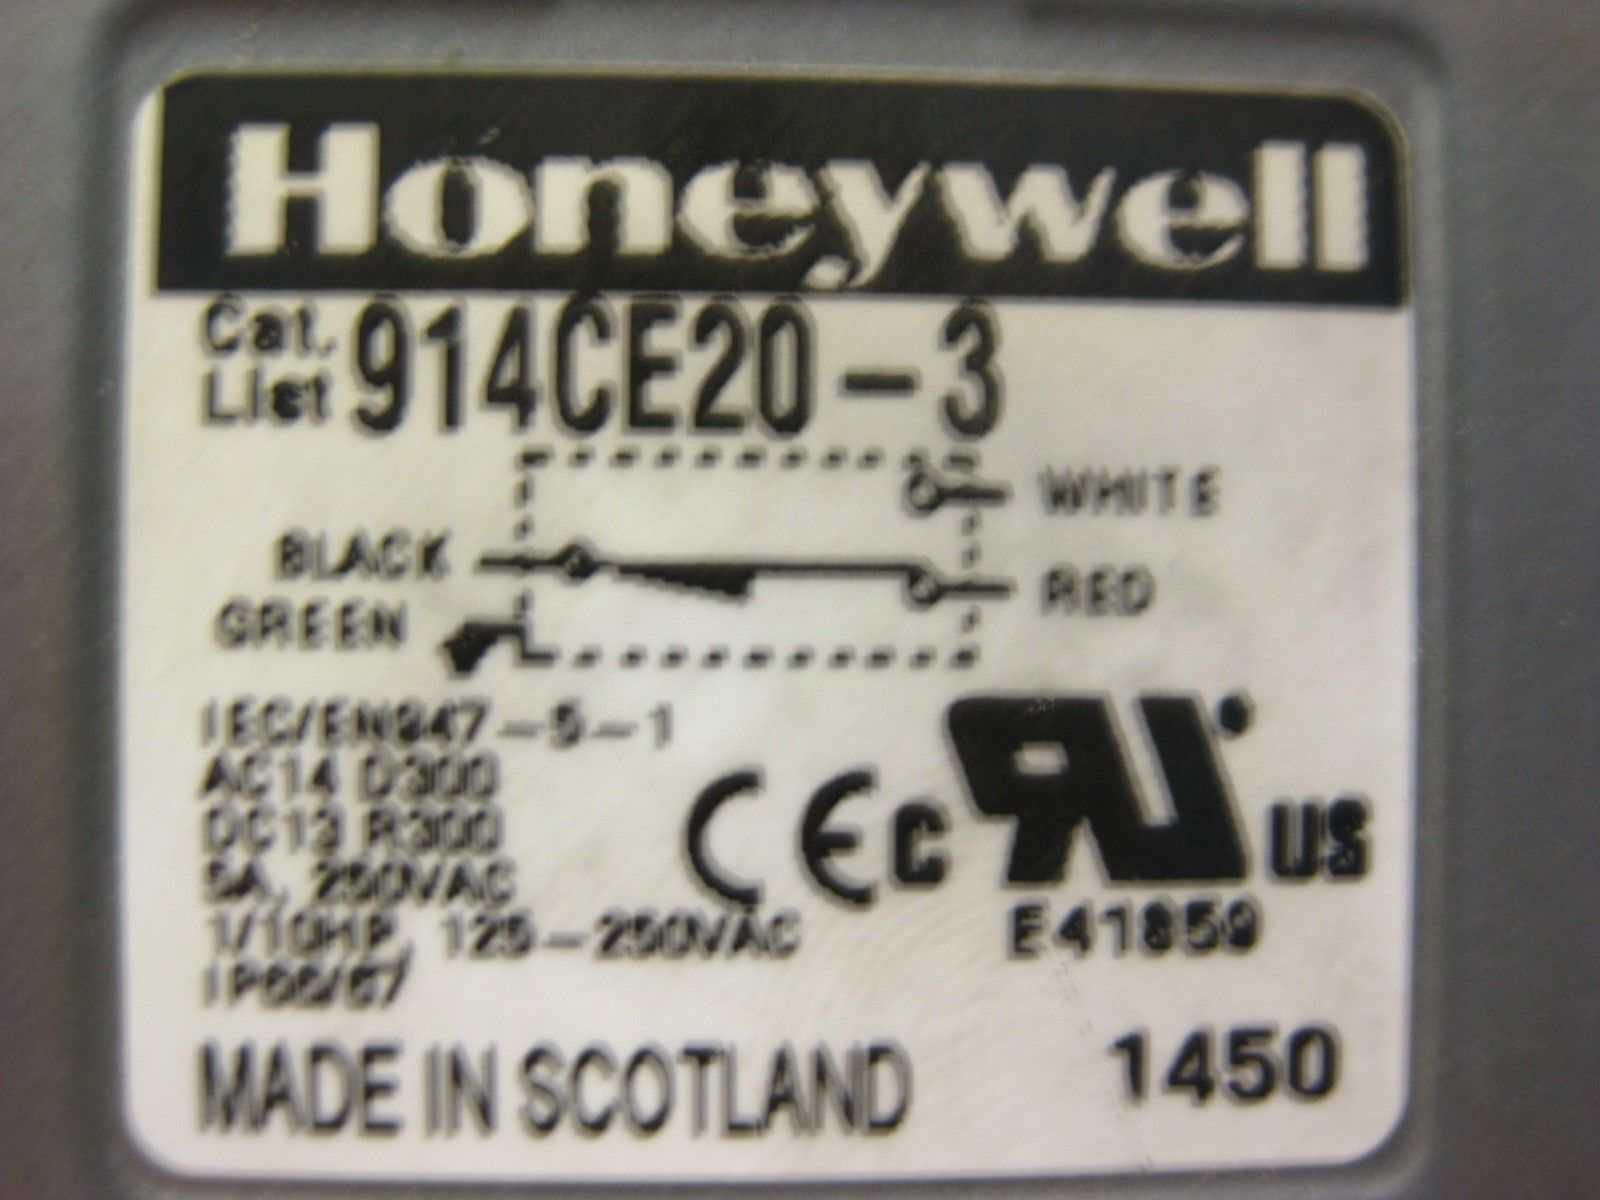 Honeywell 914CE20-3 Micro Switch, Used